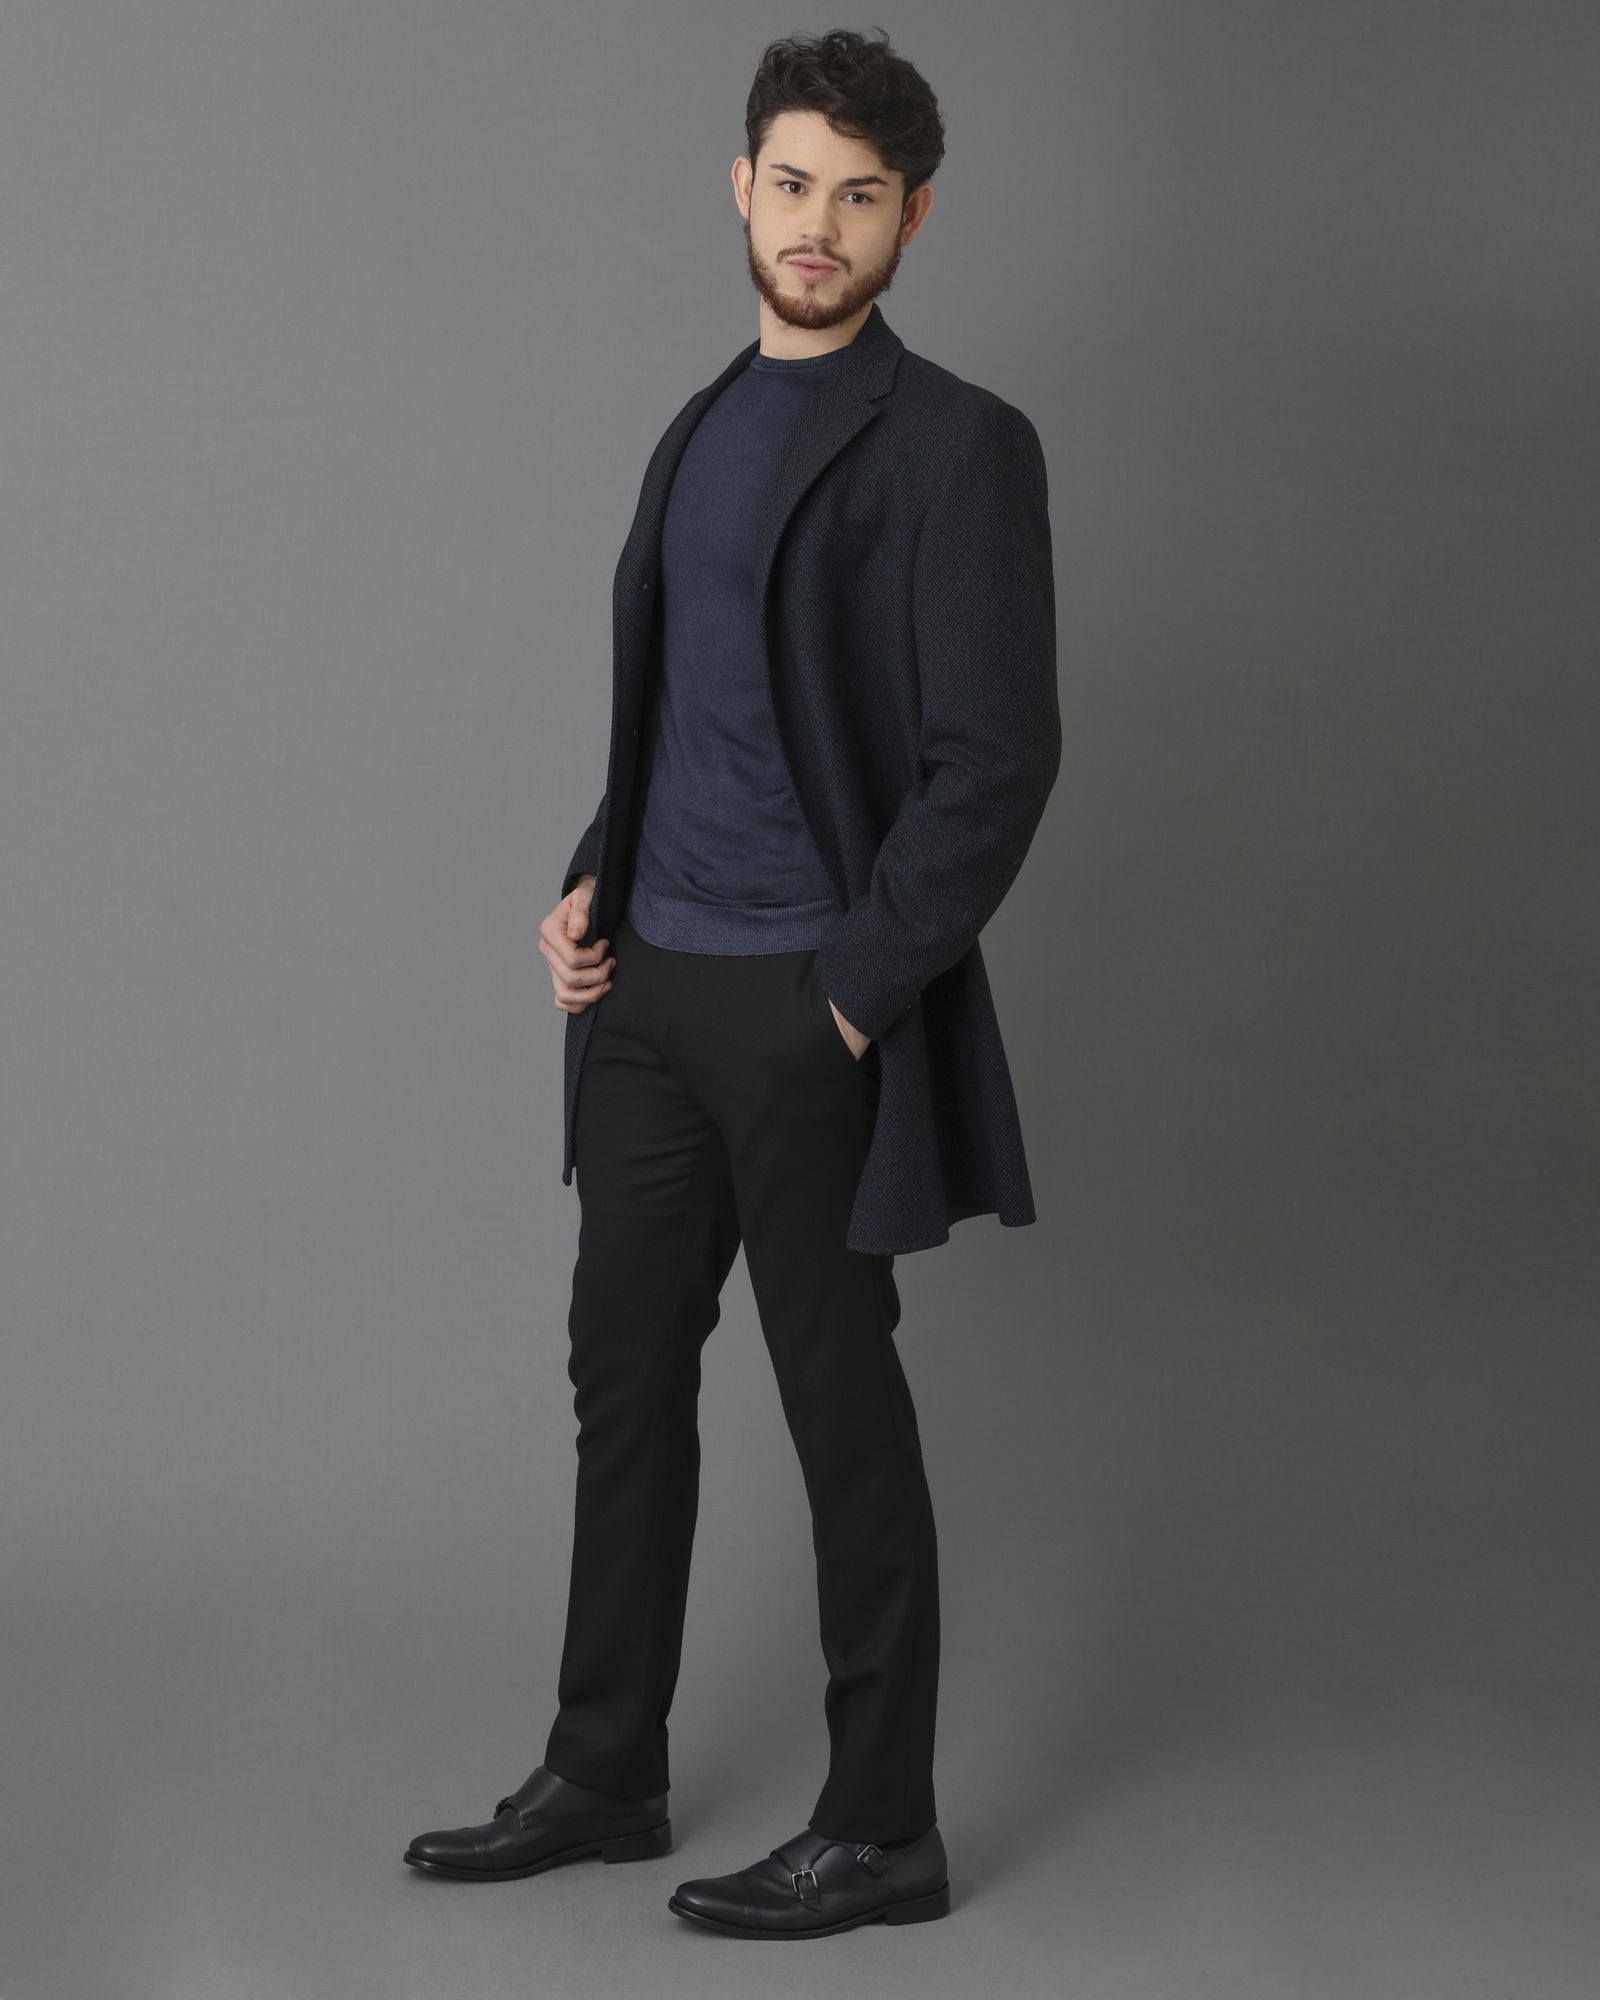 Manteau bleu Nino Danieli